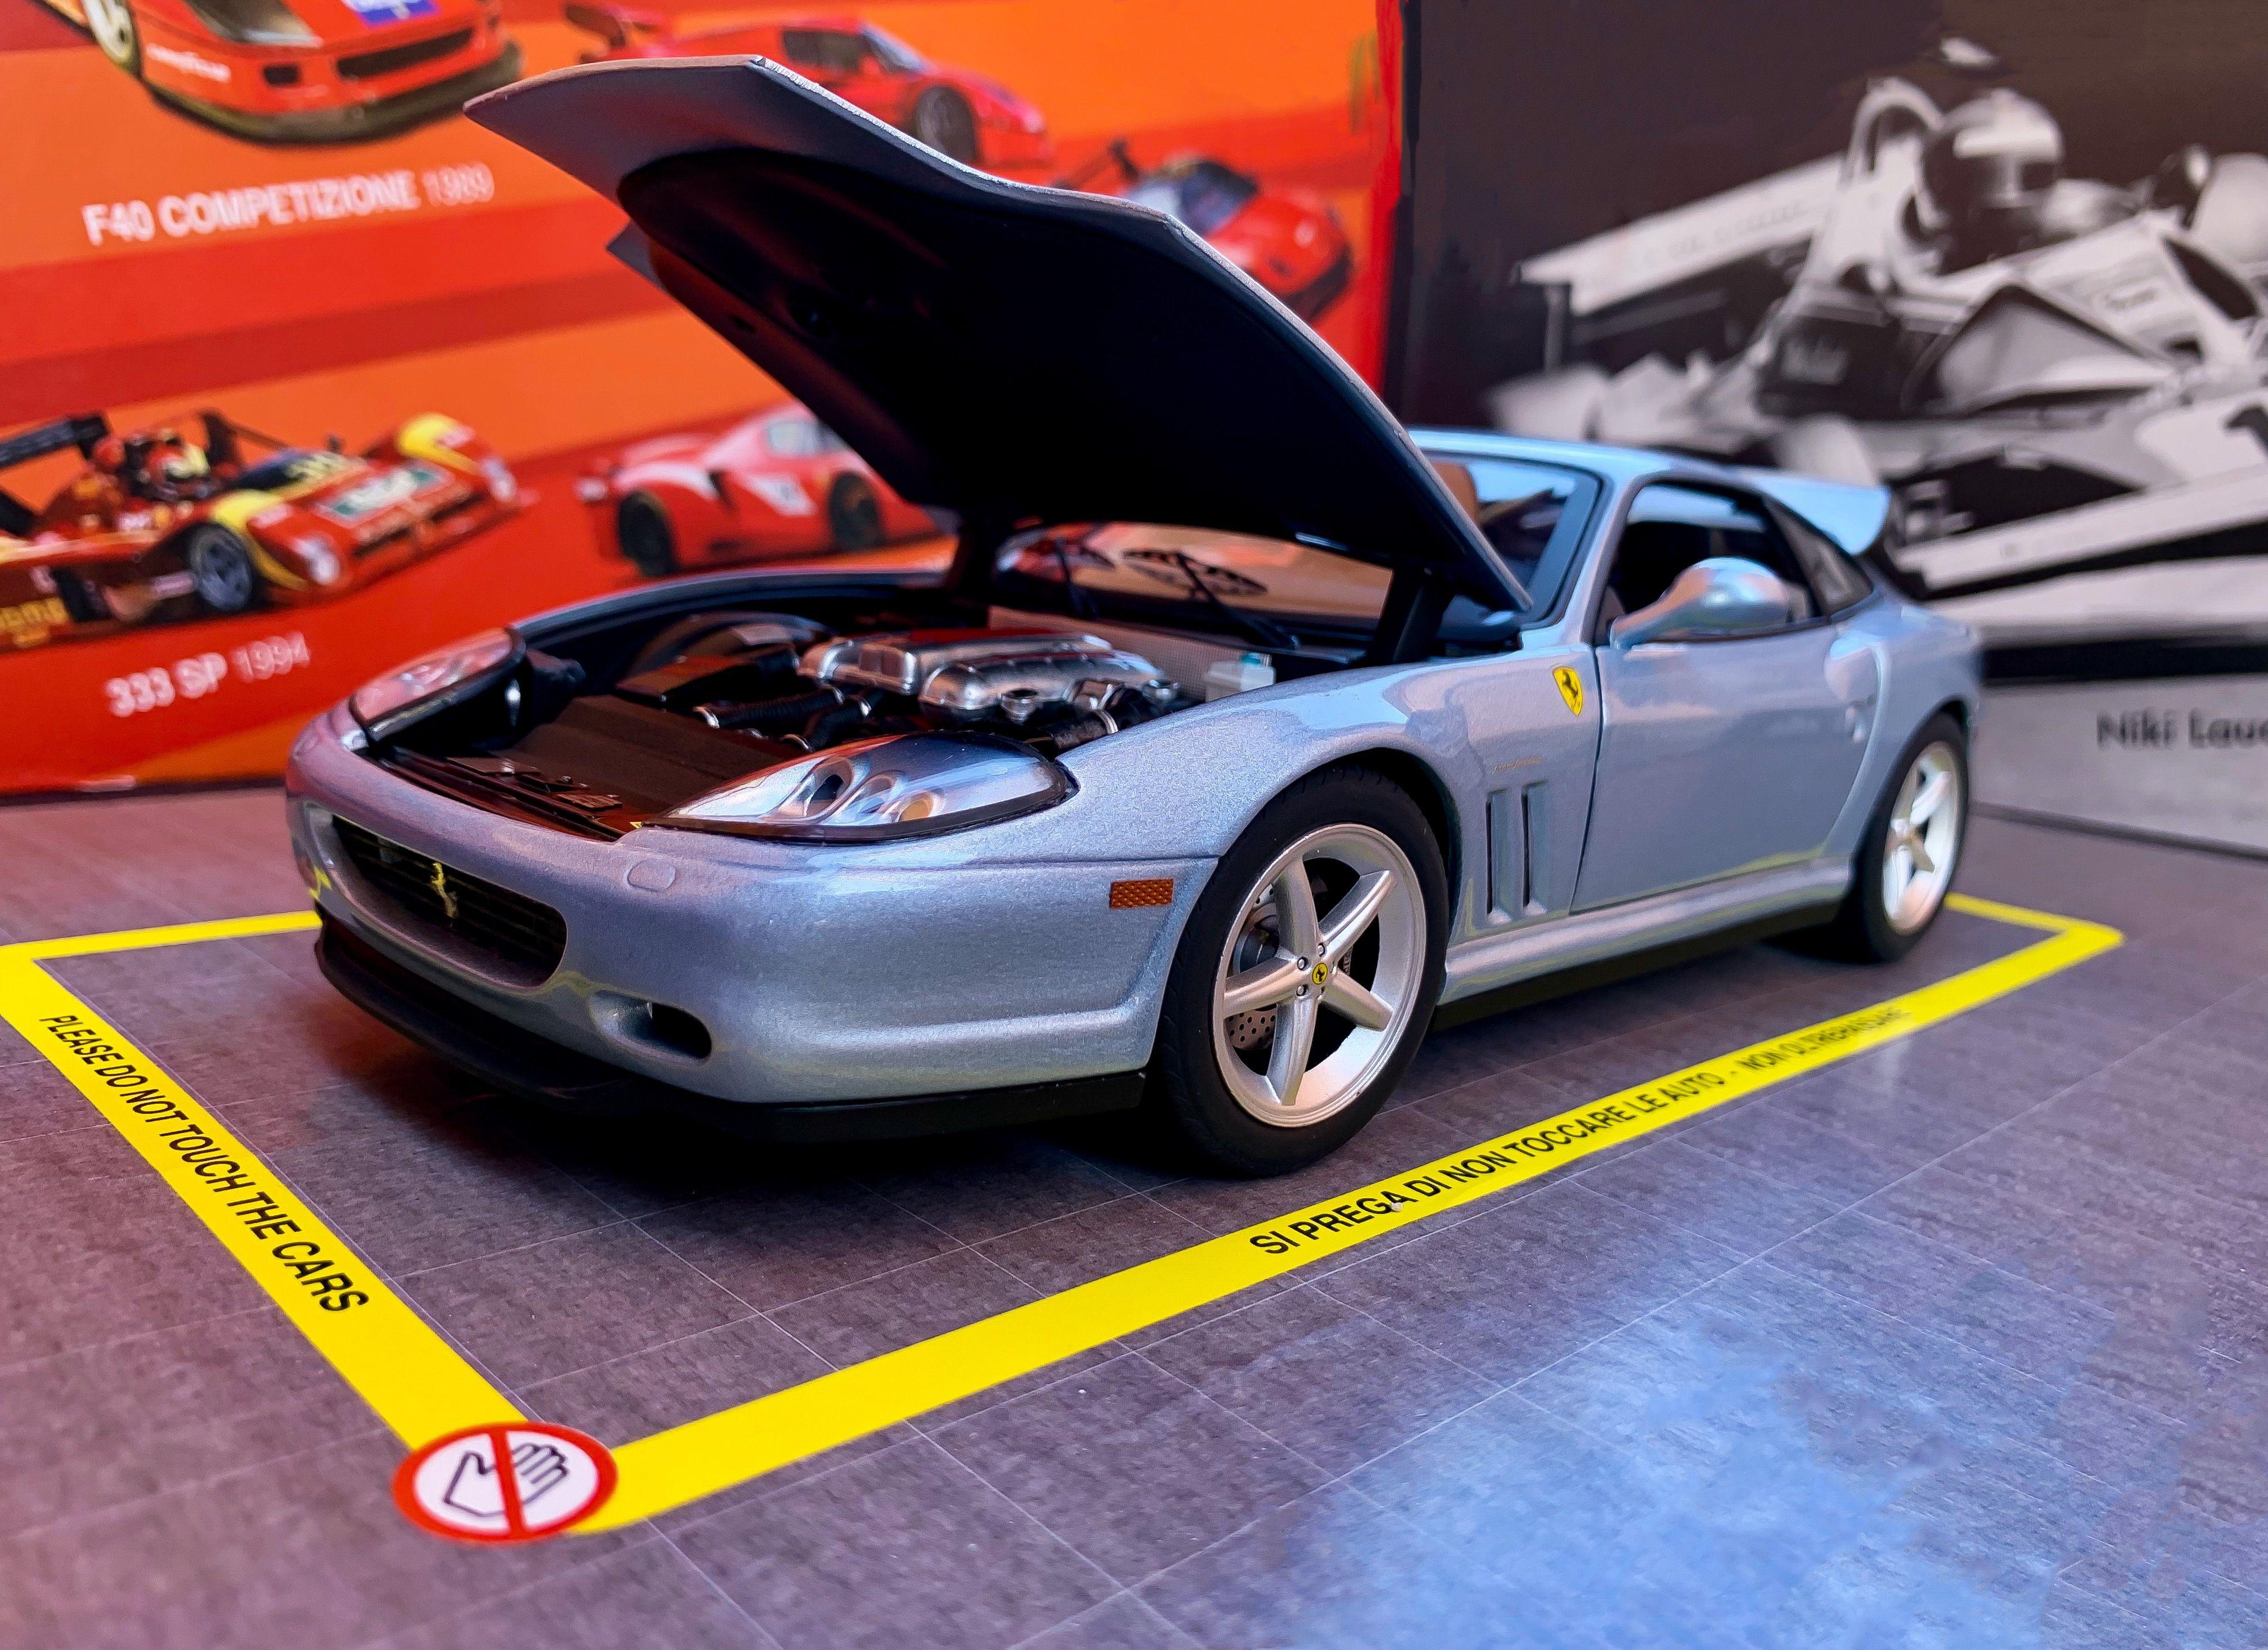 Ferrari 575 M Maranello Bad Boys 2 By Hw Elite 1 18